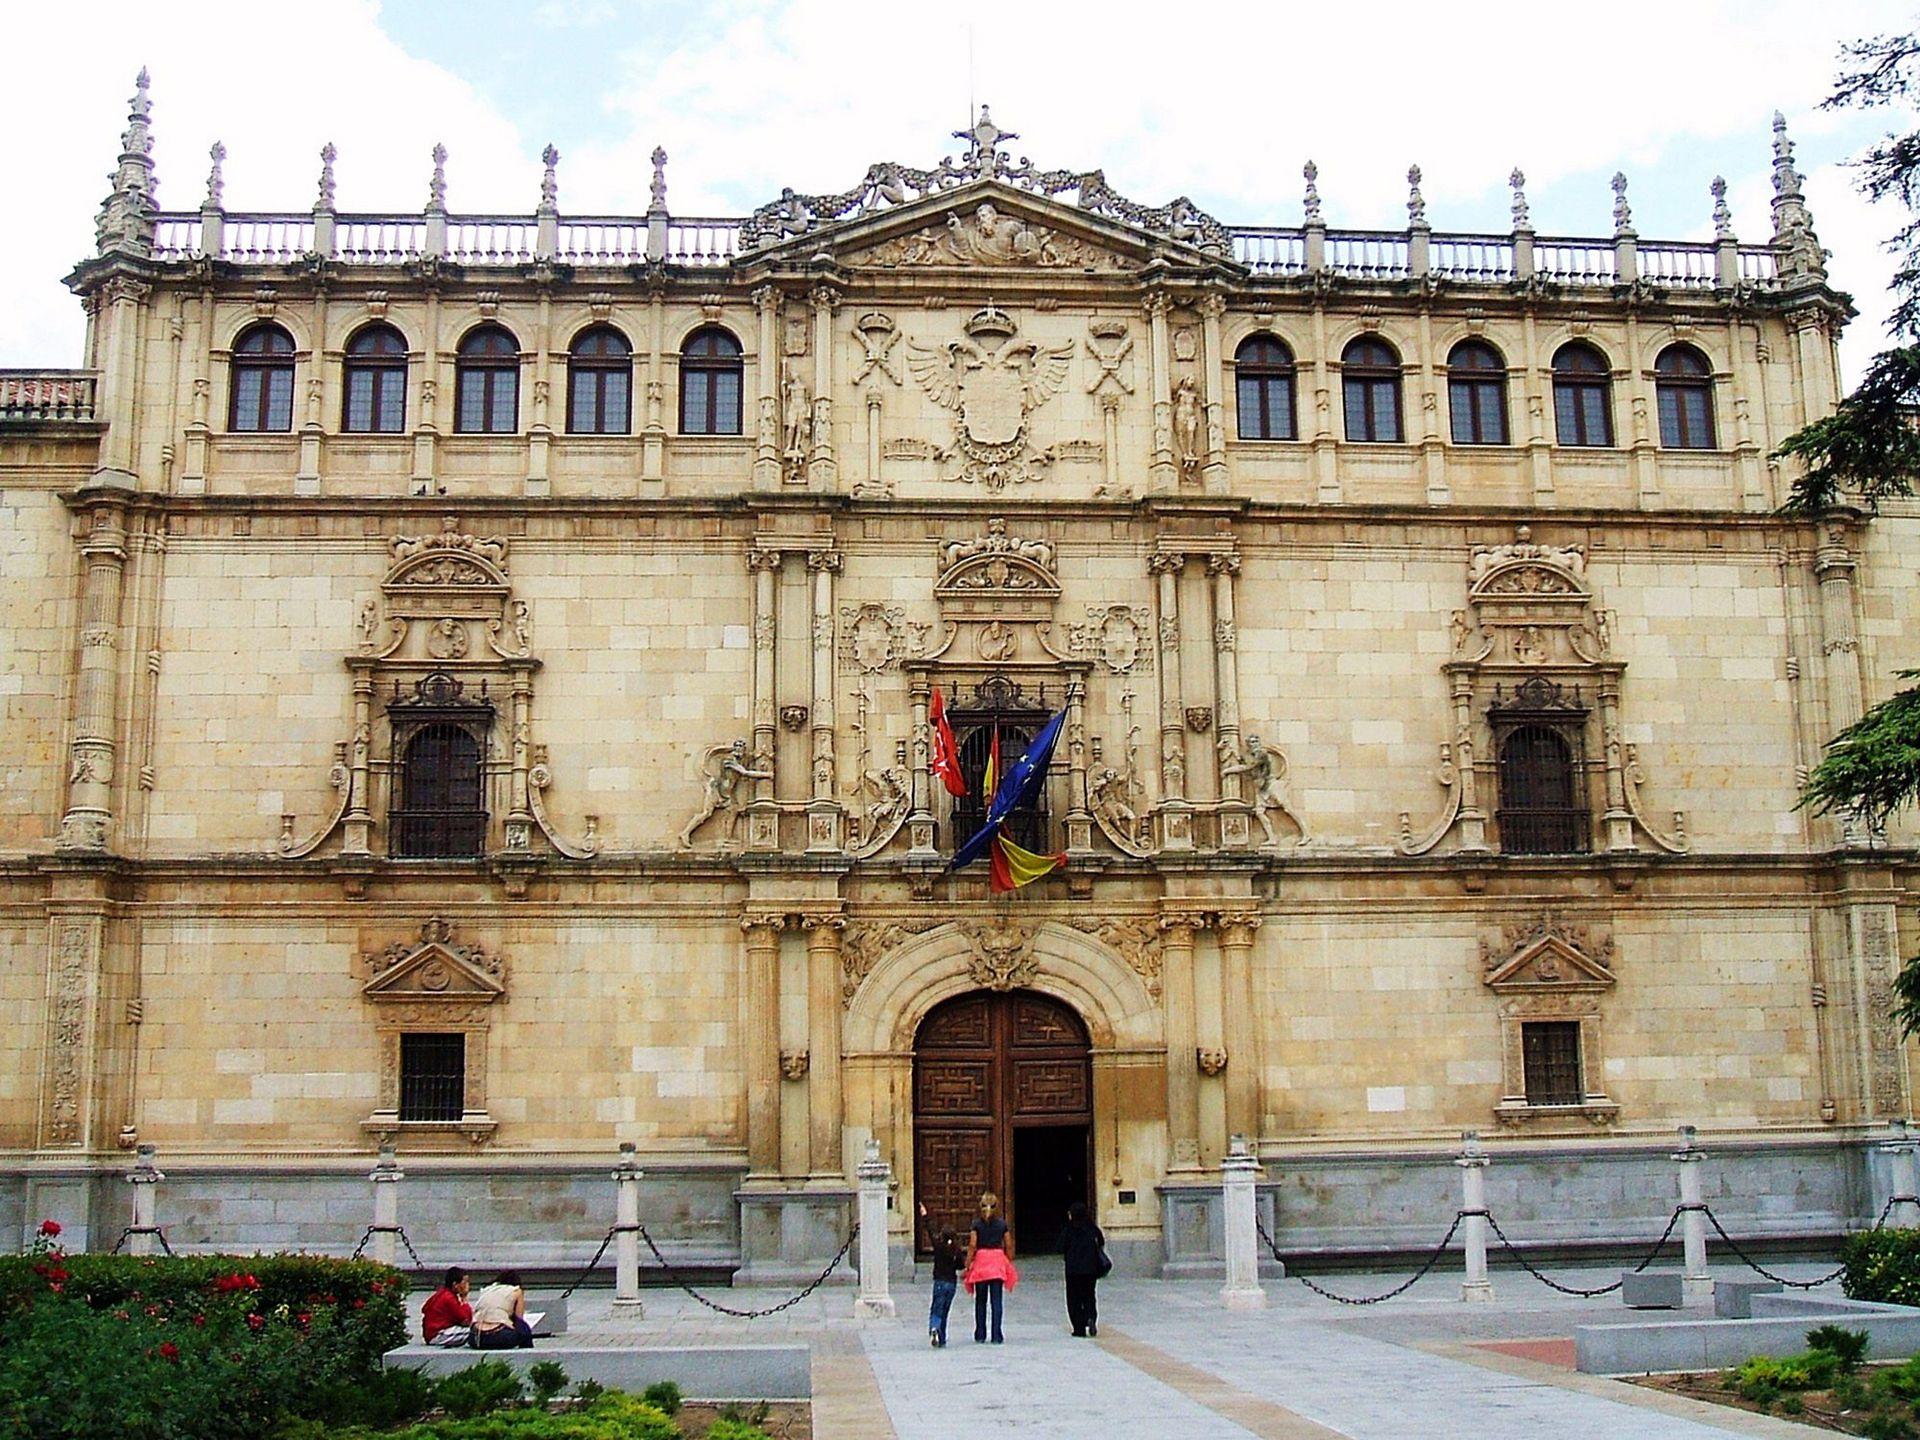 Universit di alcal wikipedia - Casas regionales alcala de henares ...